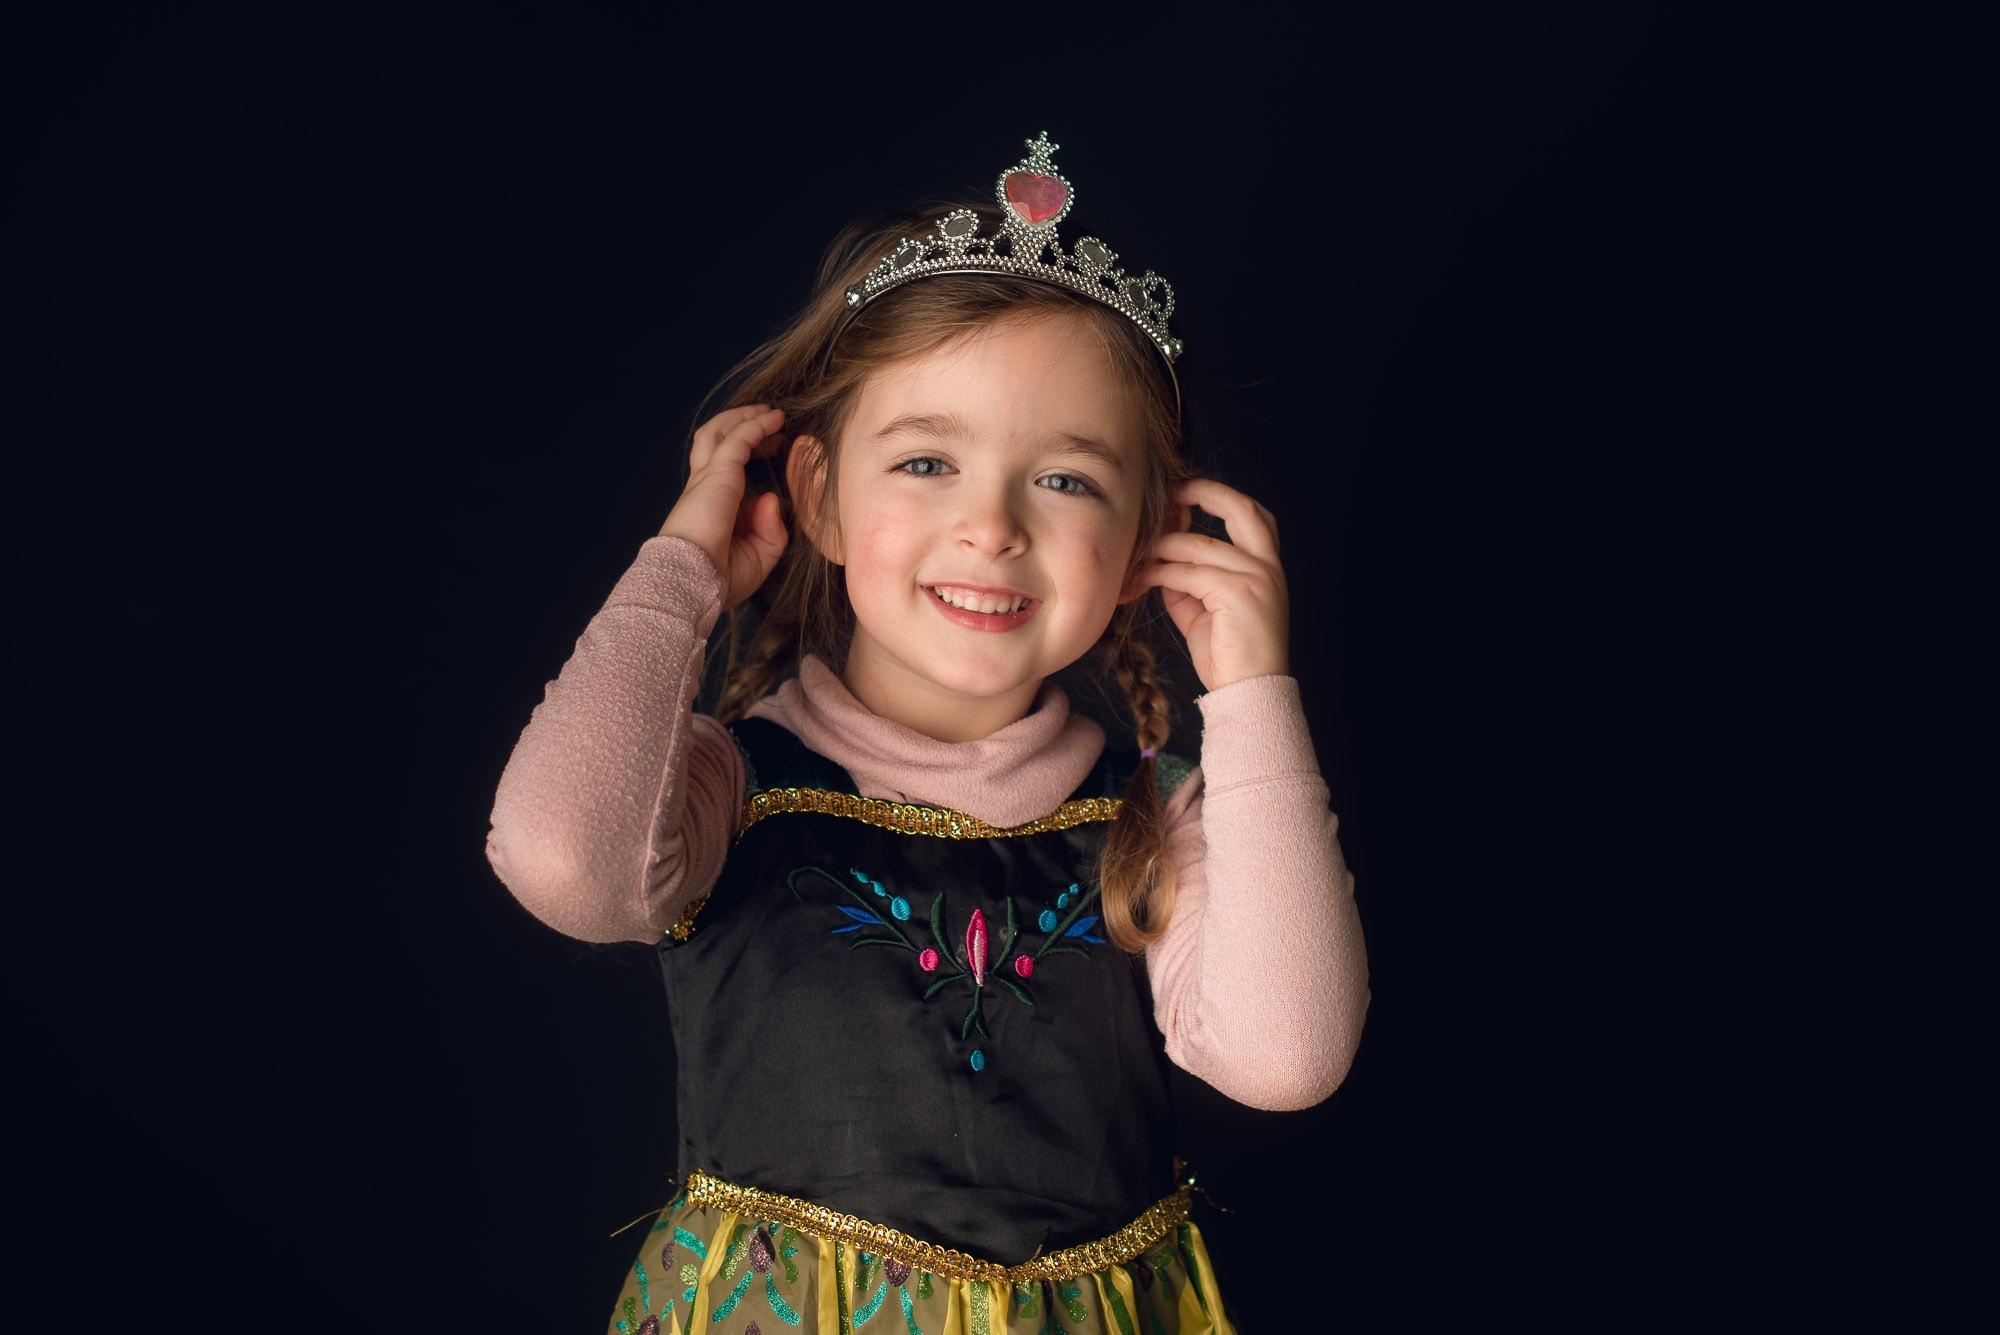 girl dressed like princess anna